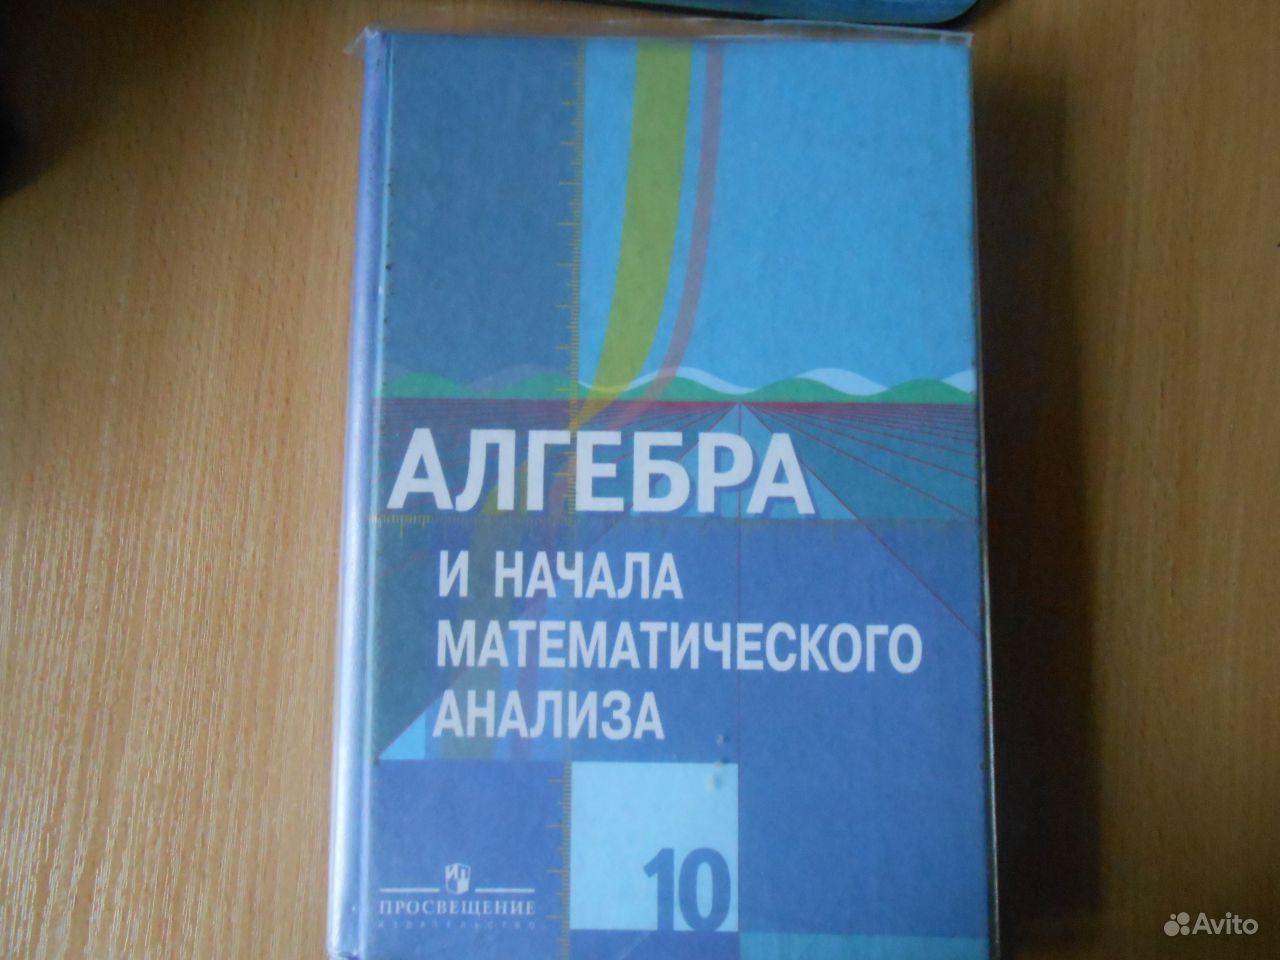 Гдз По Алгебре По Жижченко